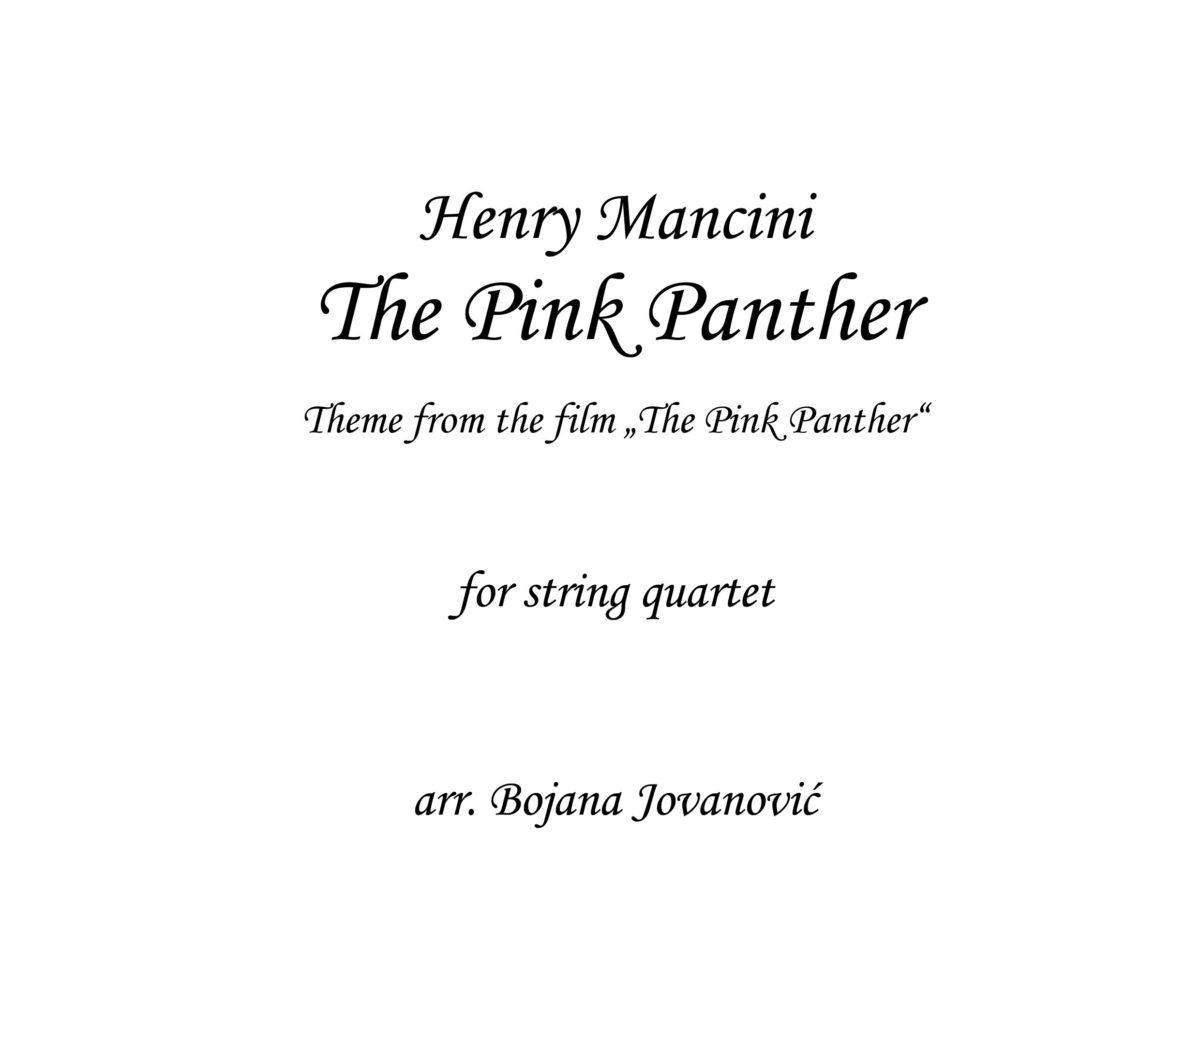 The Pink Panther Henry Mancini Sheet music